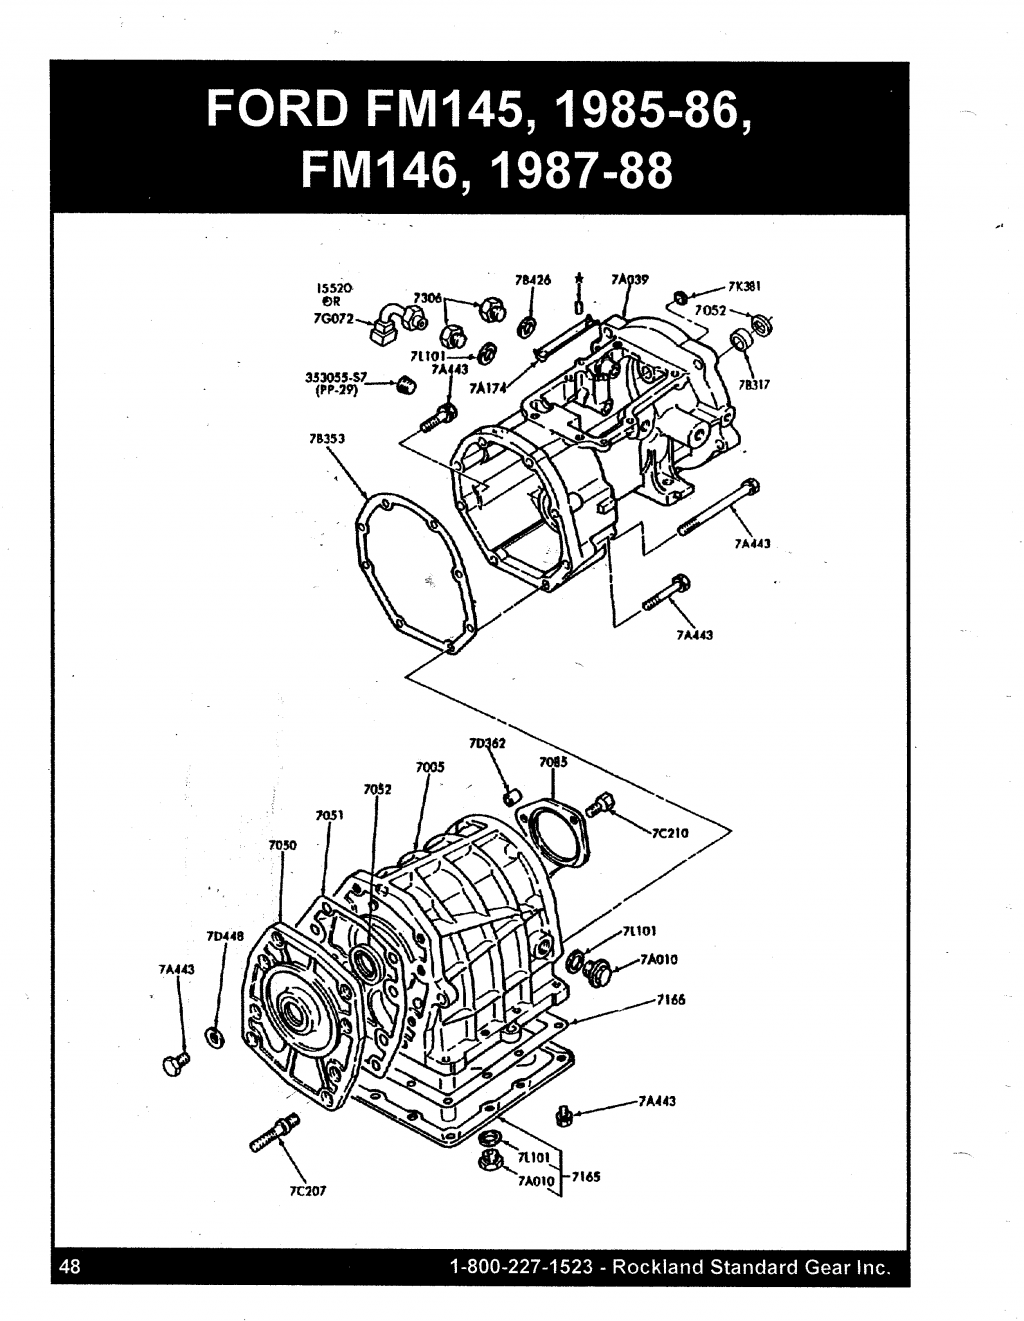 Mitsubishi Transmission Diagrams : Ford mitsubishi fm case rsgear